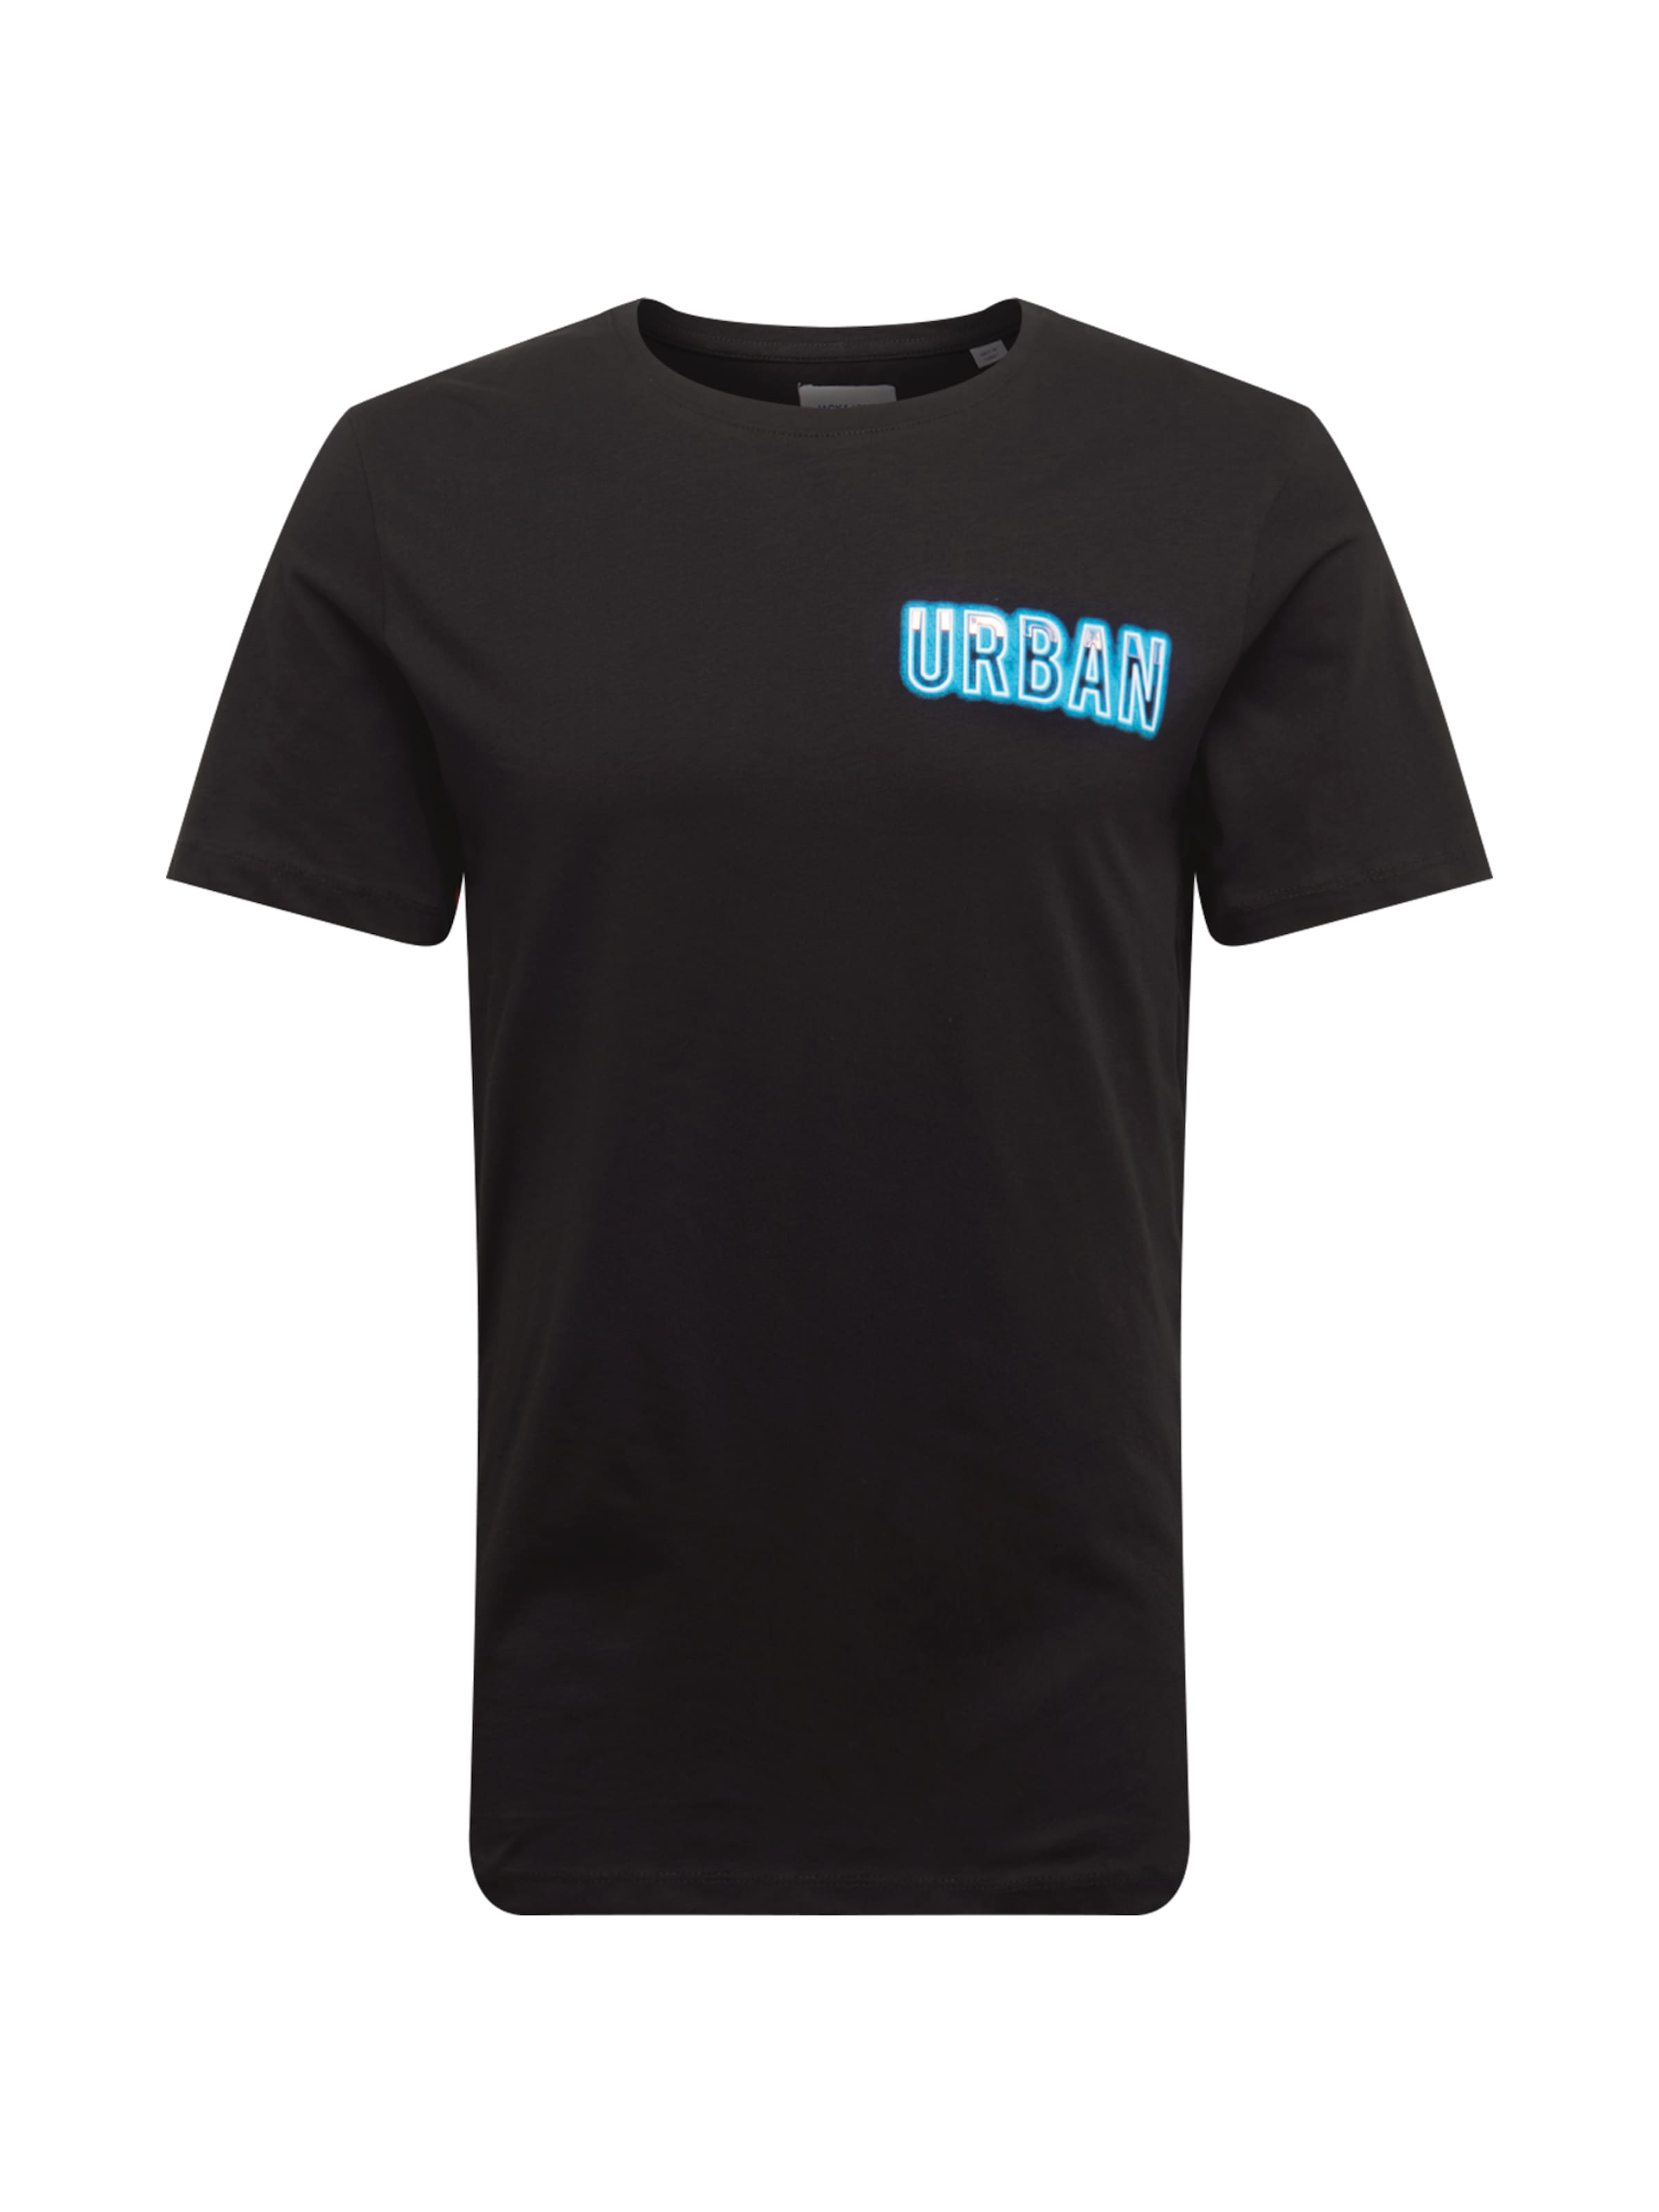 AquaRouge Feu shirt 'joradriel' En Jackamp; T Noir Jones 7I6gvmfYby